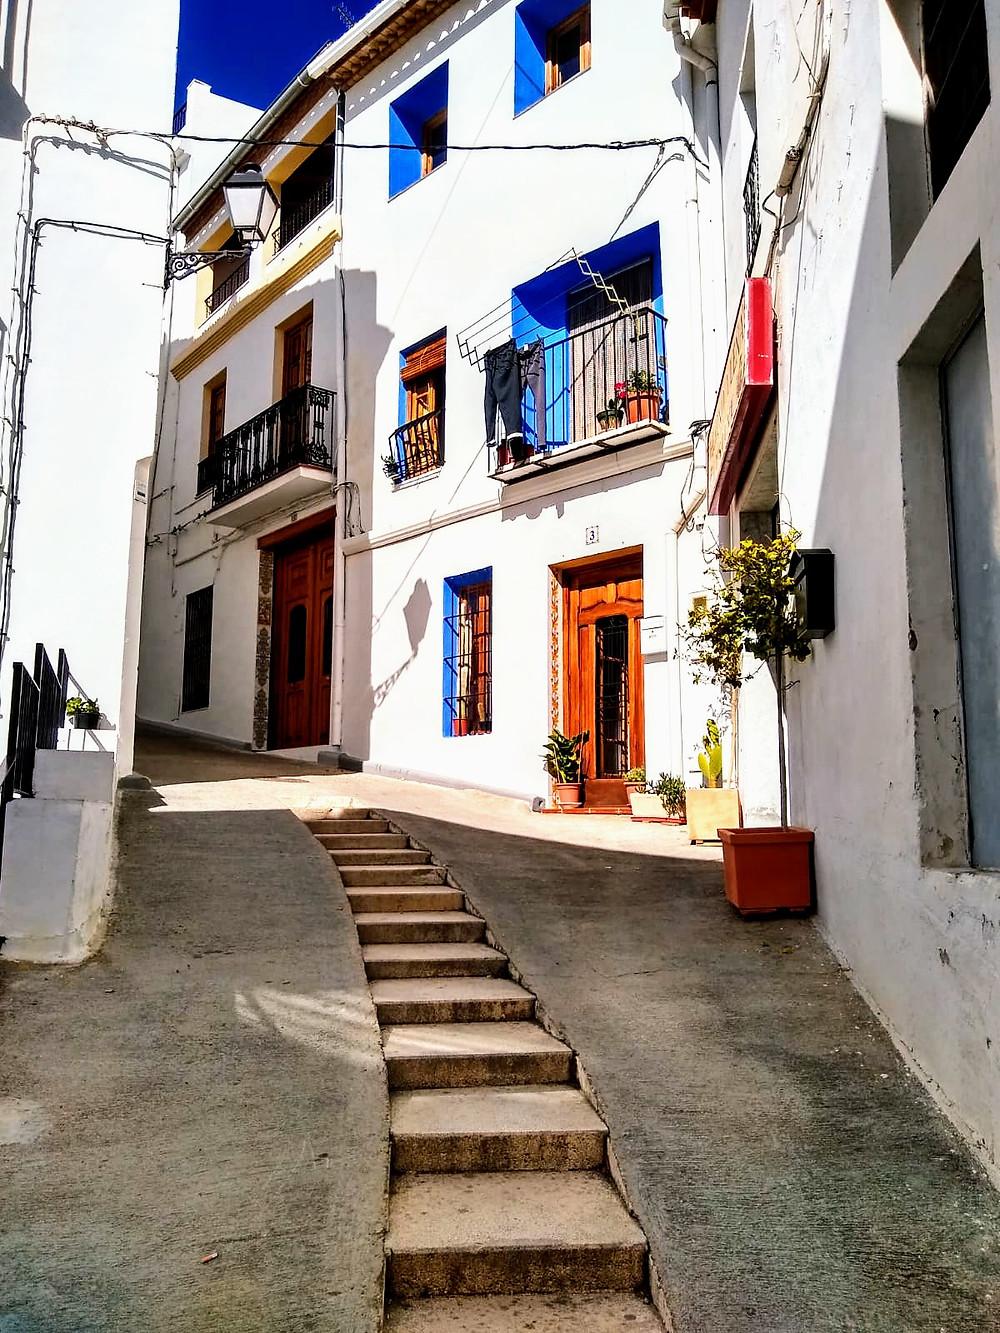 Las calles de Chulilla, Valencia